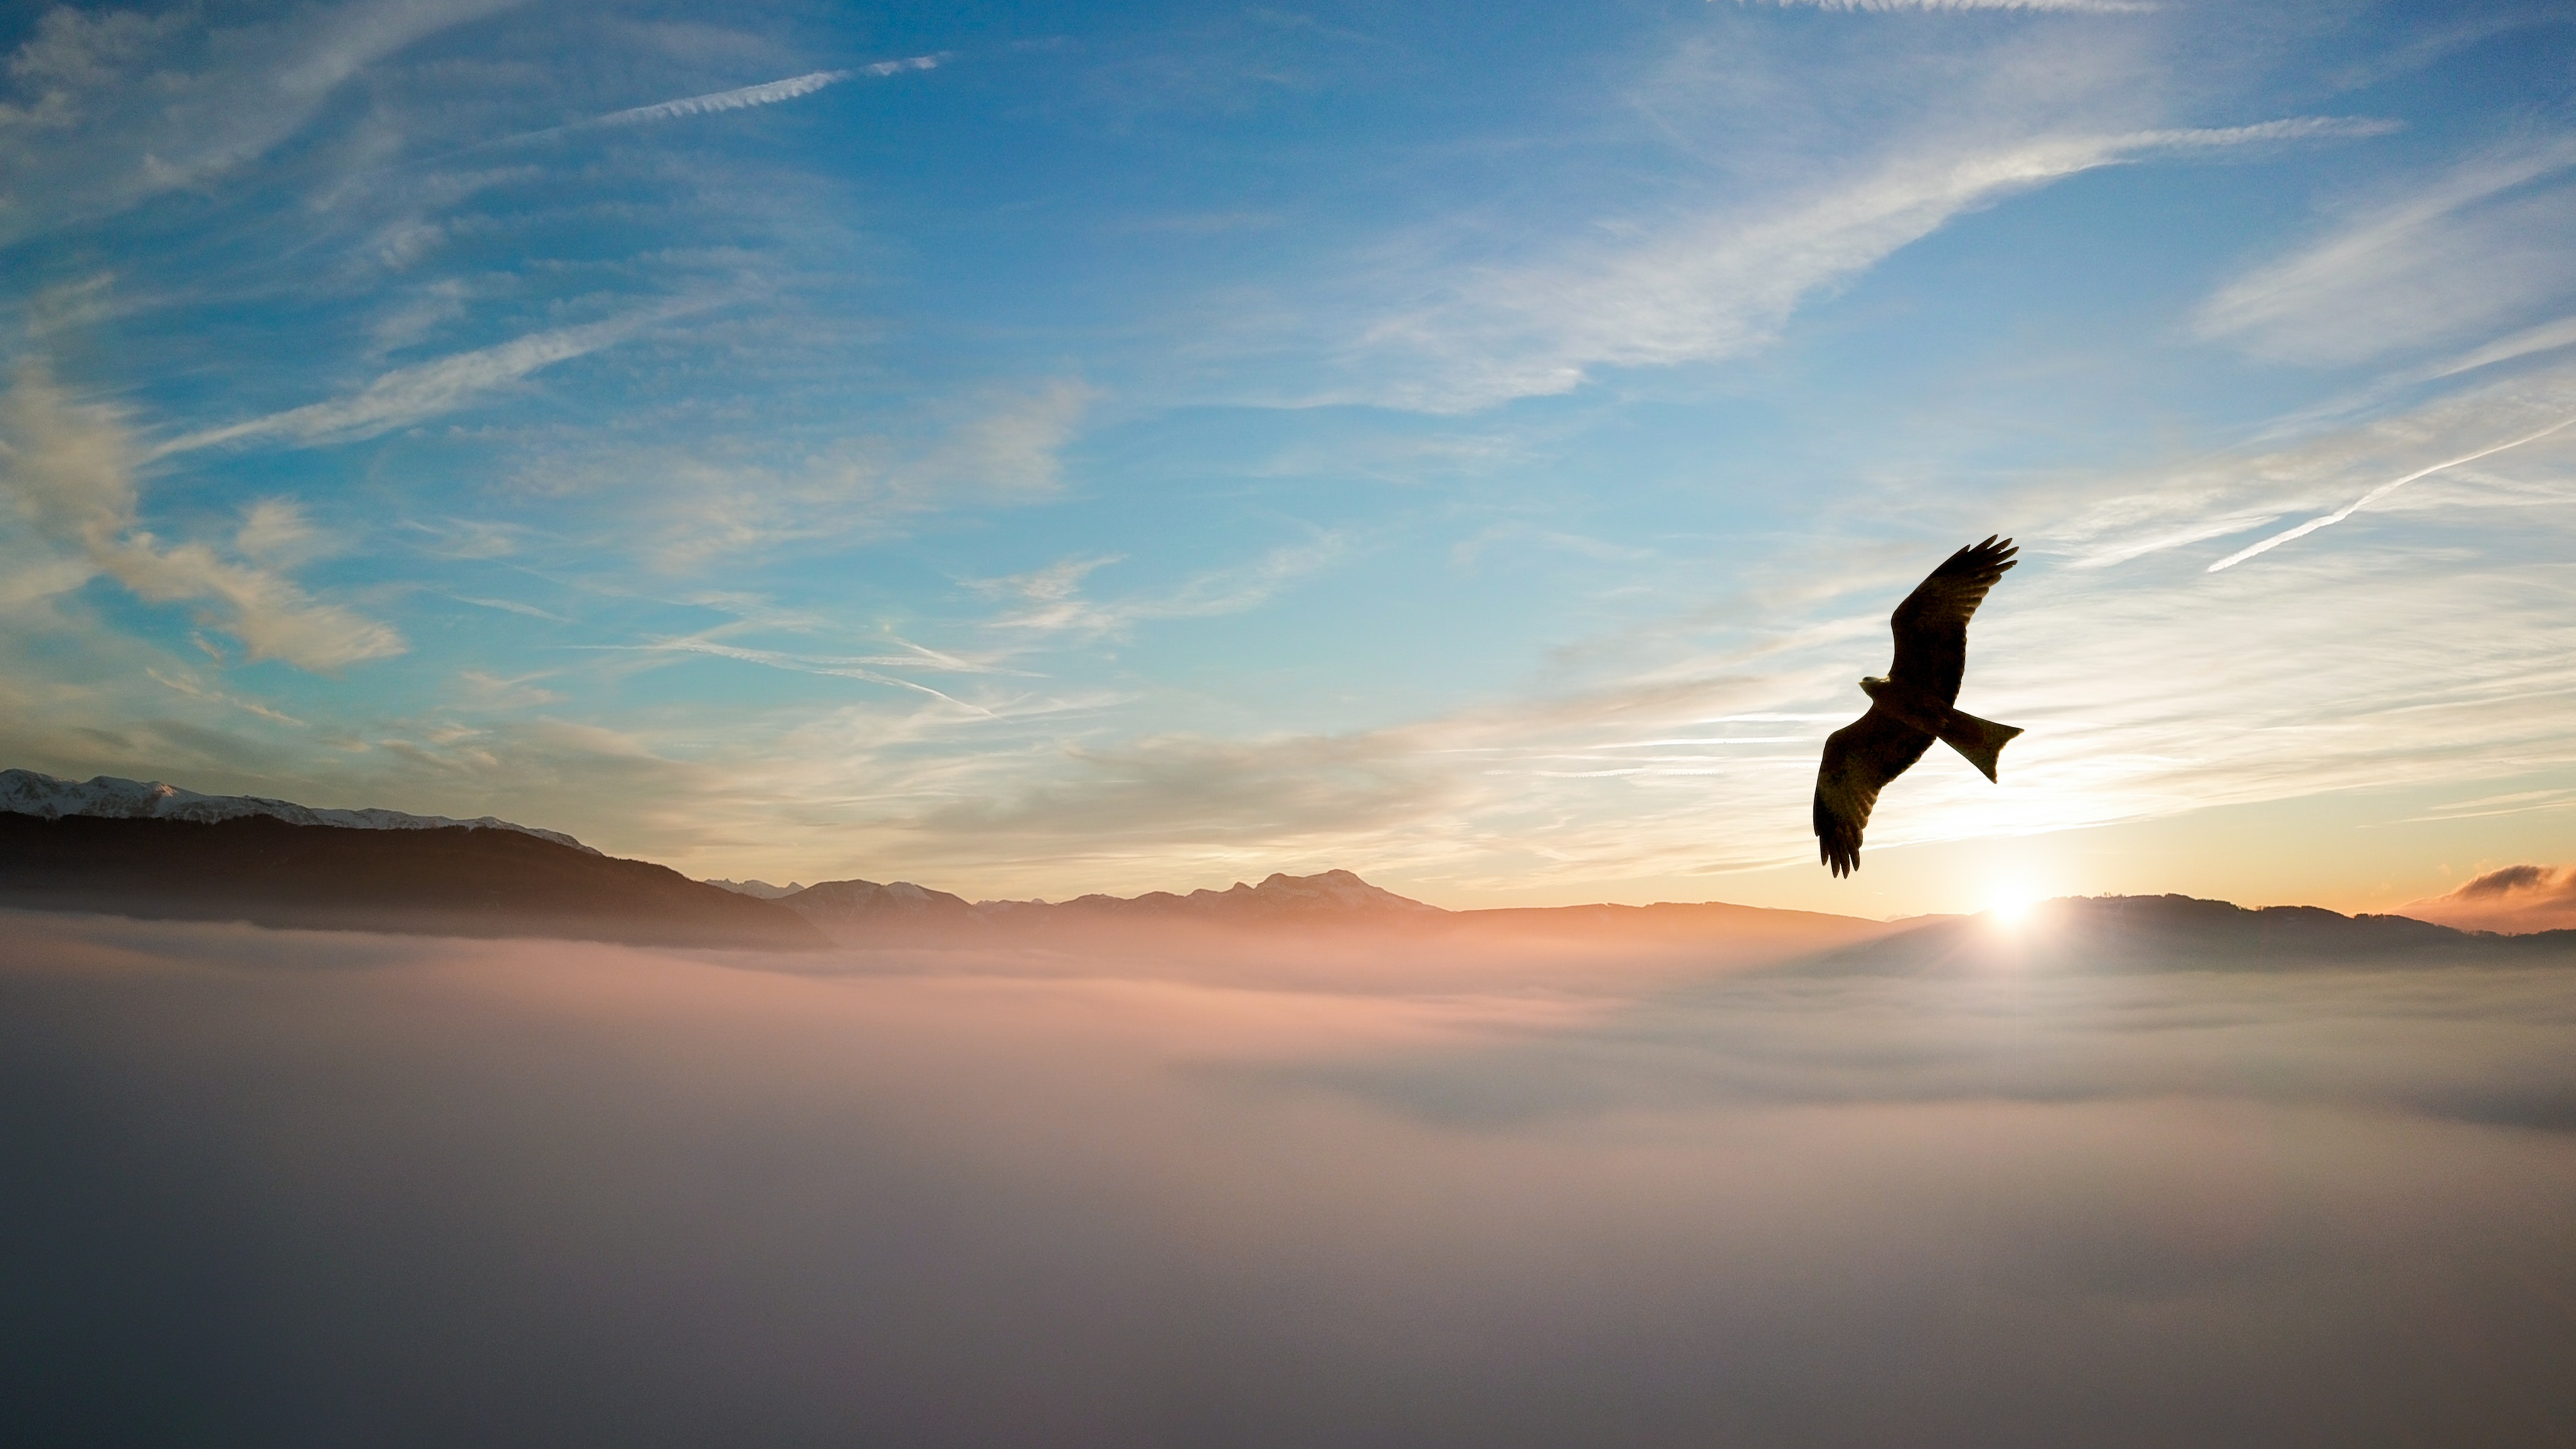 bird in the clouds